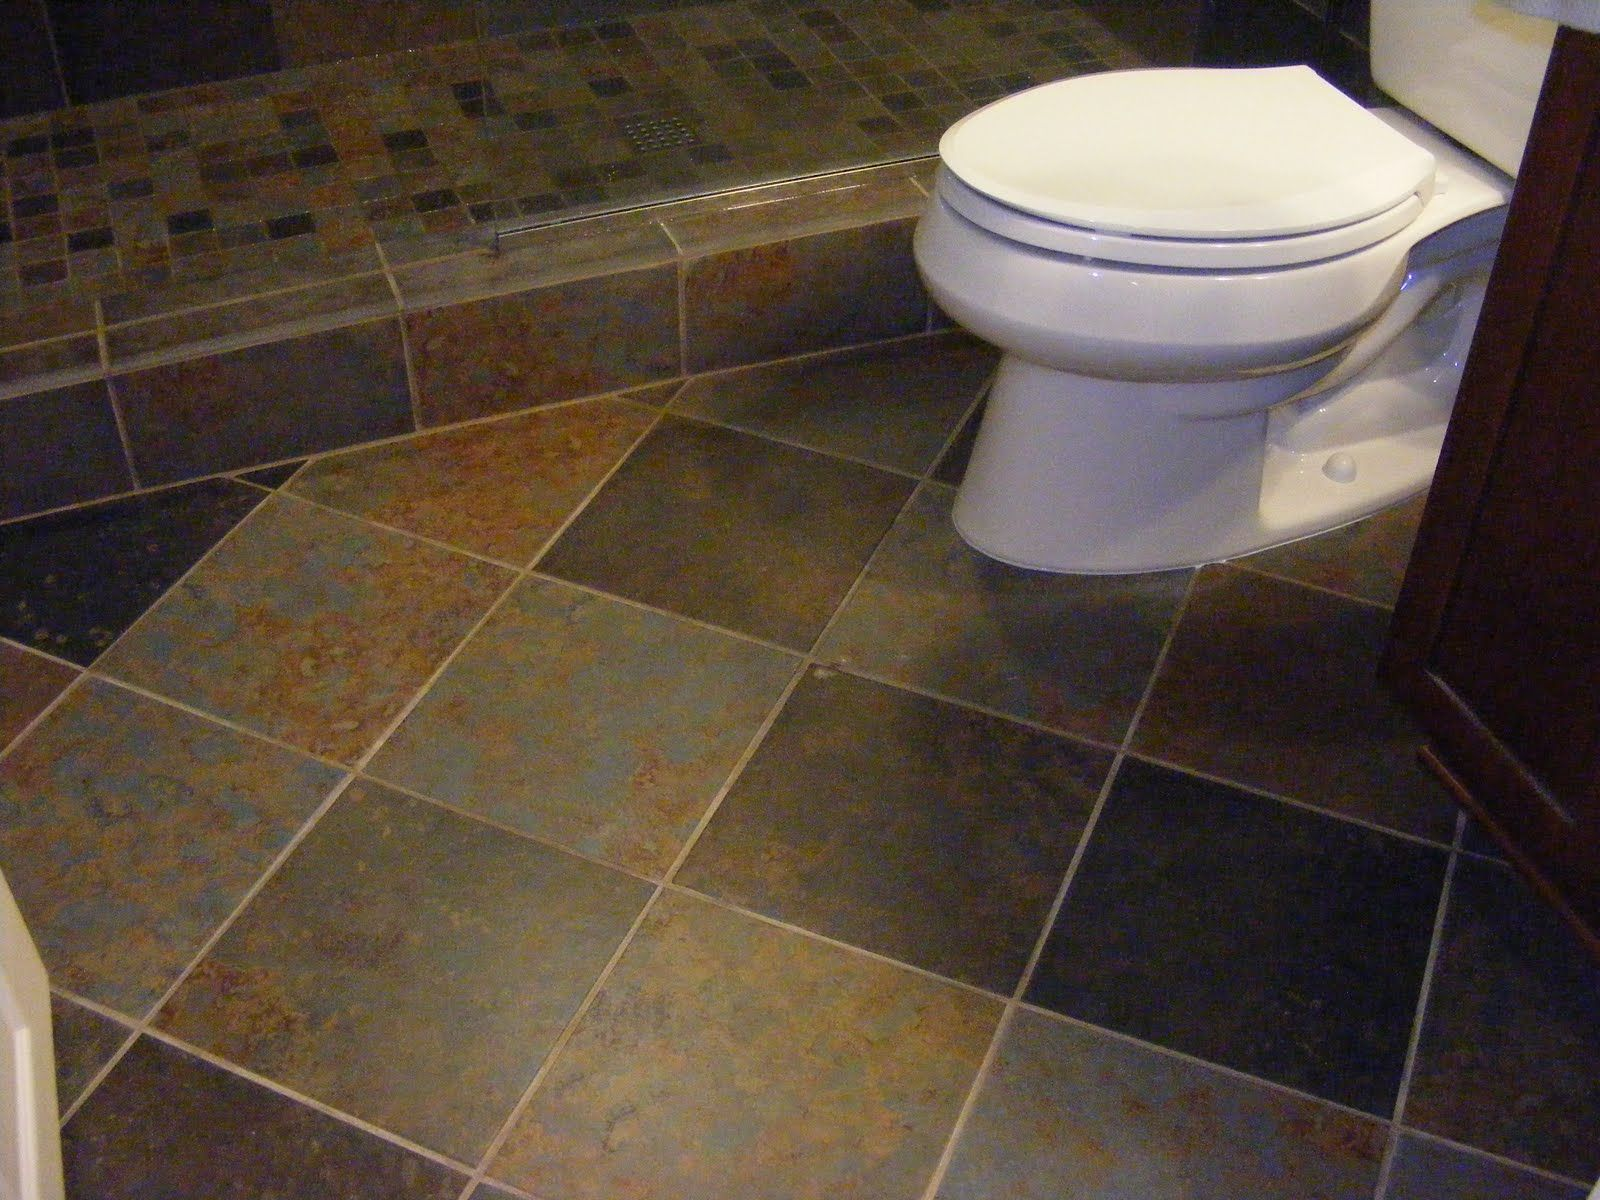 Retro inspired octagon and dot bathroom floor tile